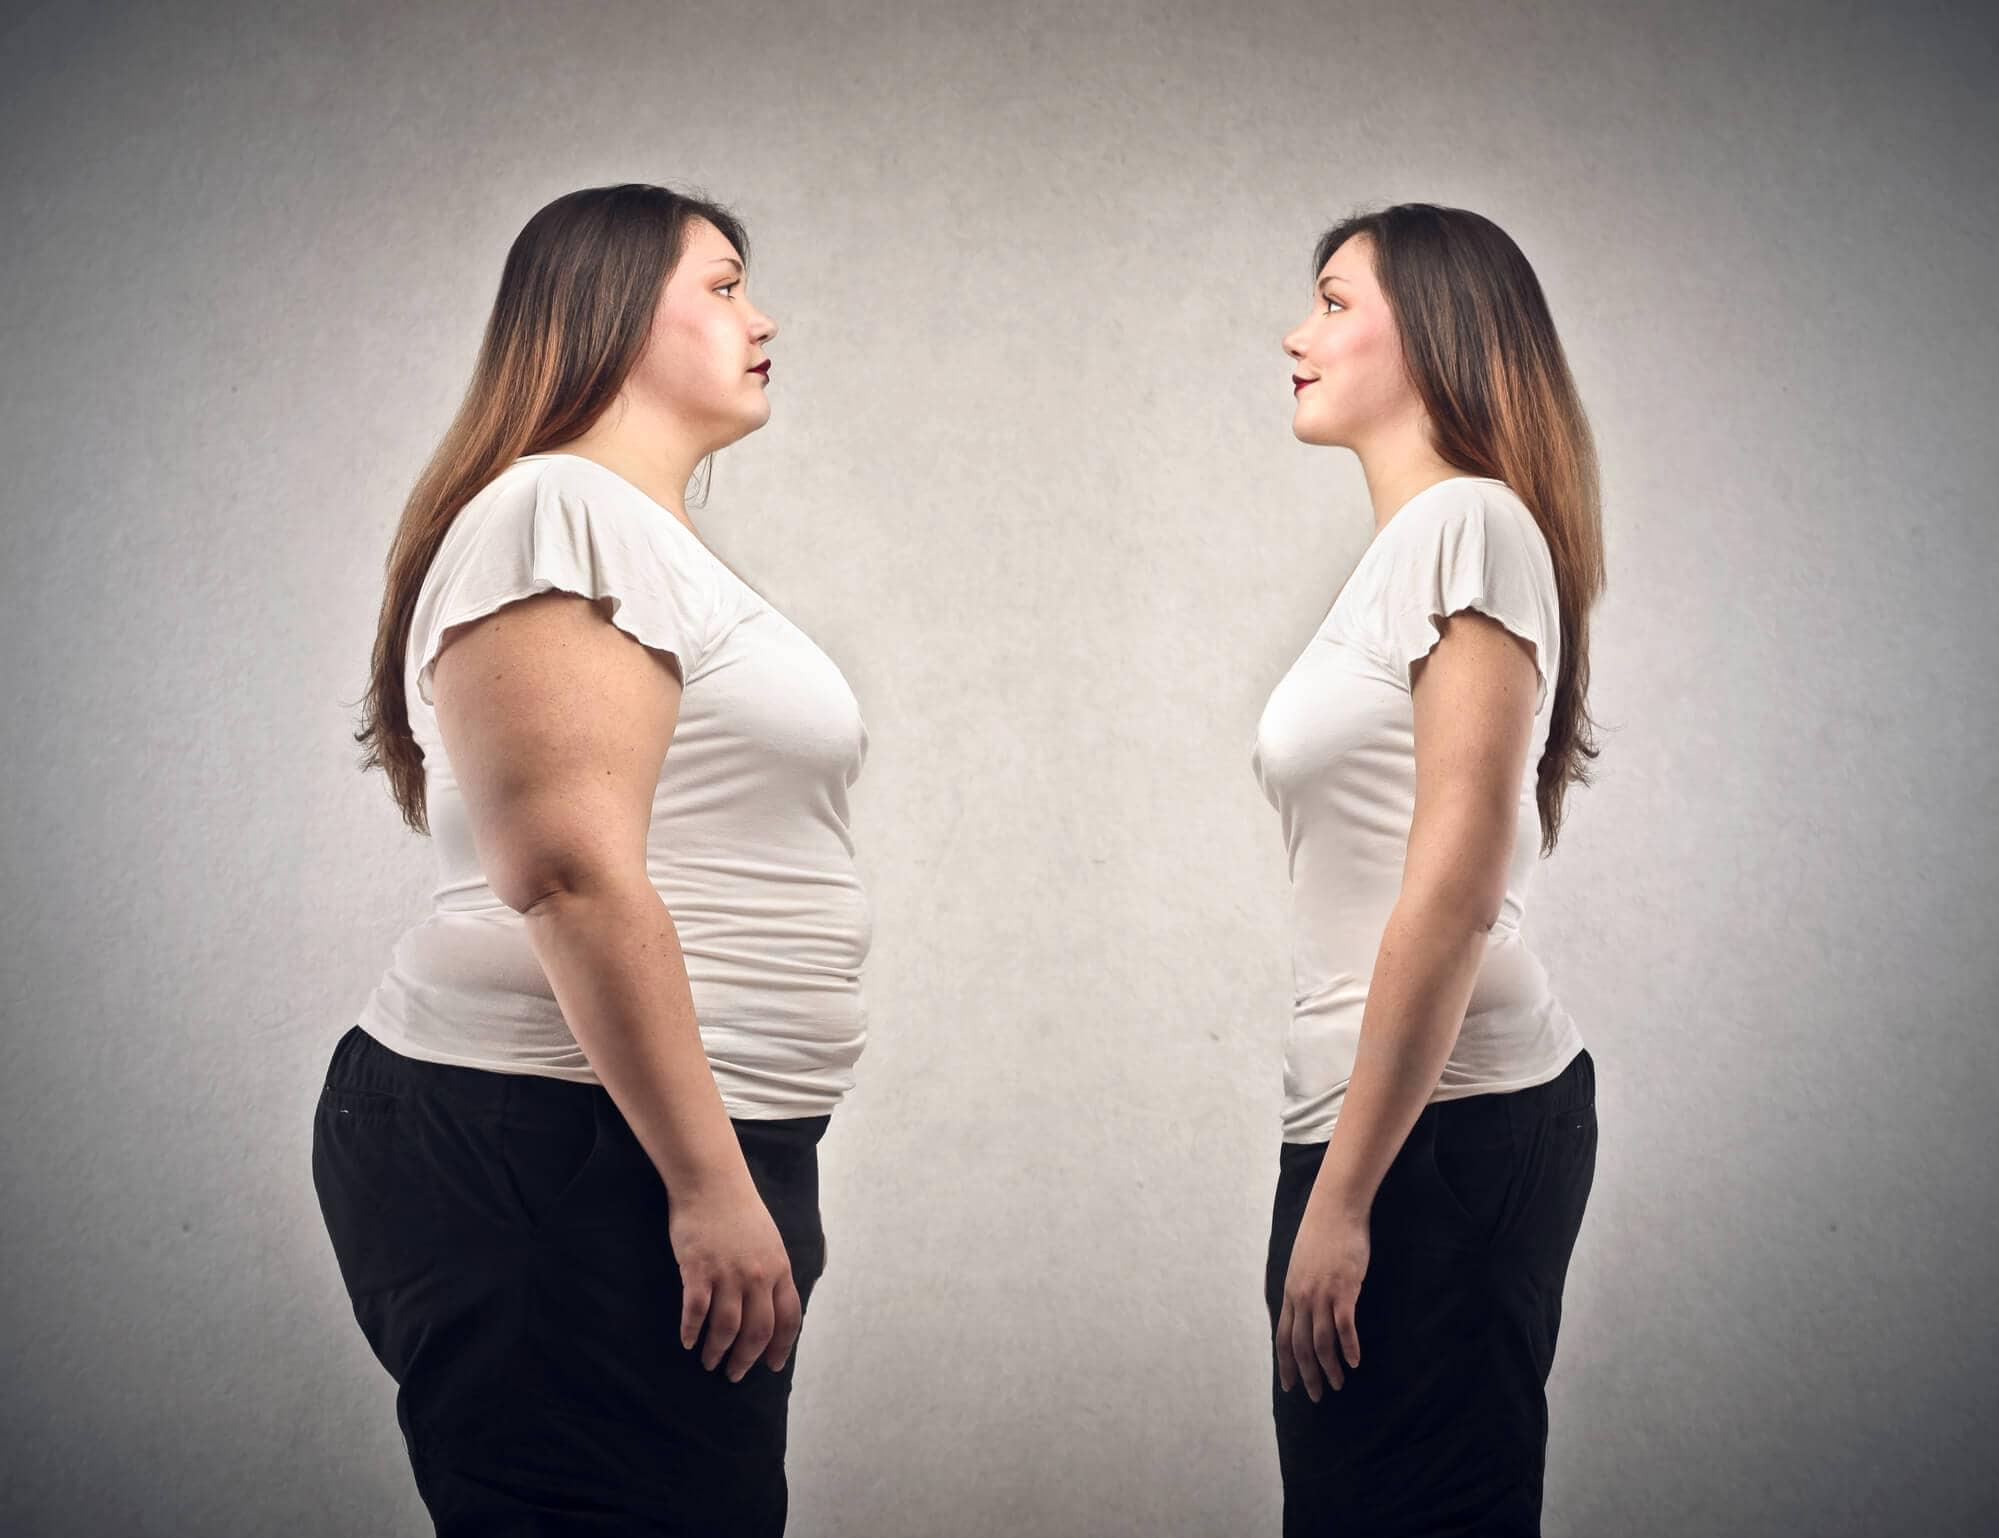 weight watchers vorher nachher க்கான பட முடிவு